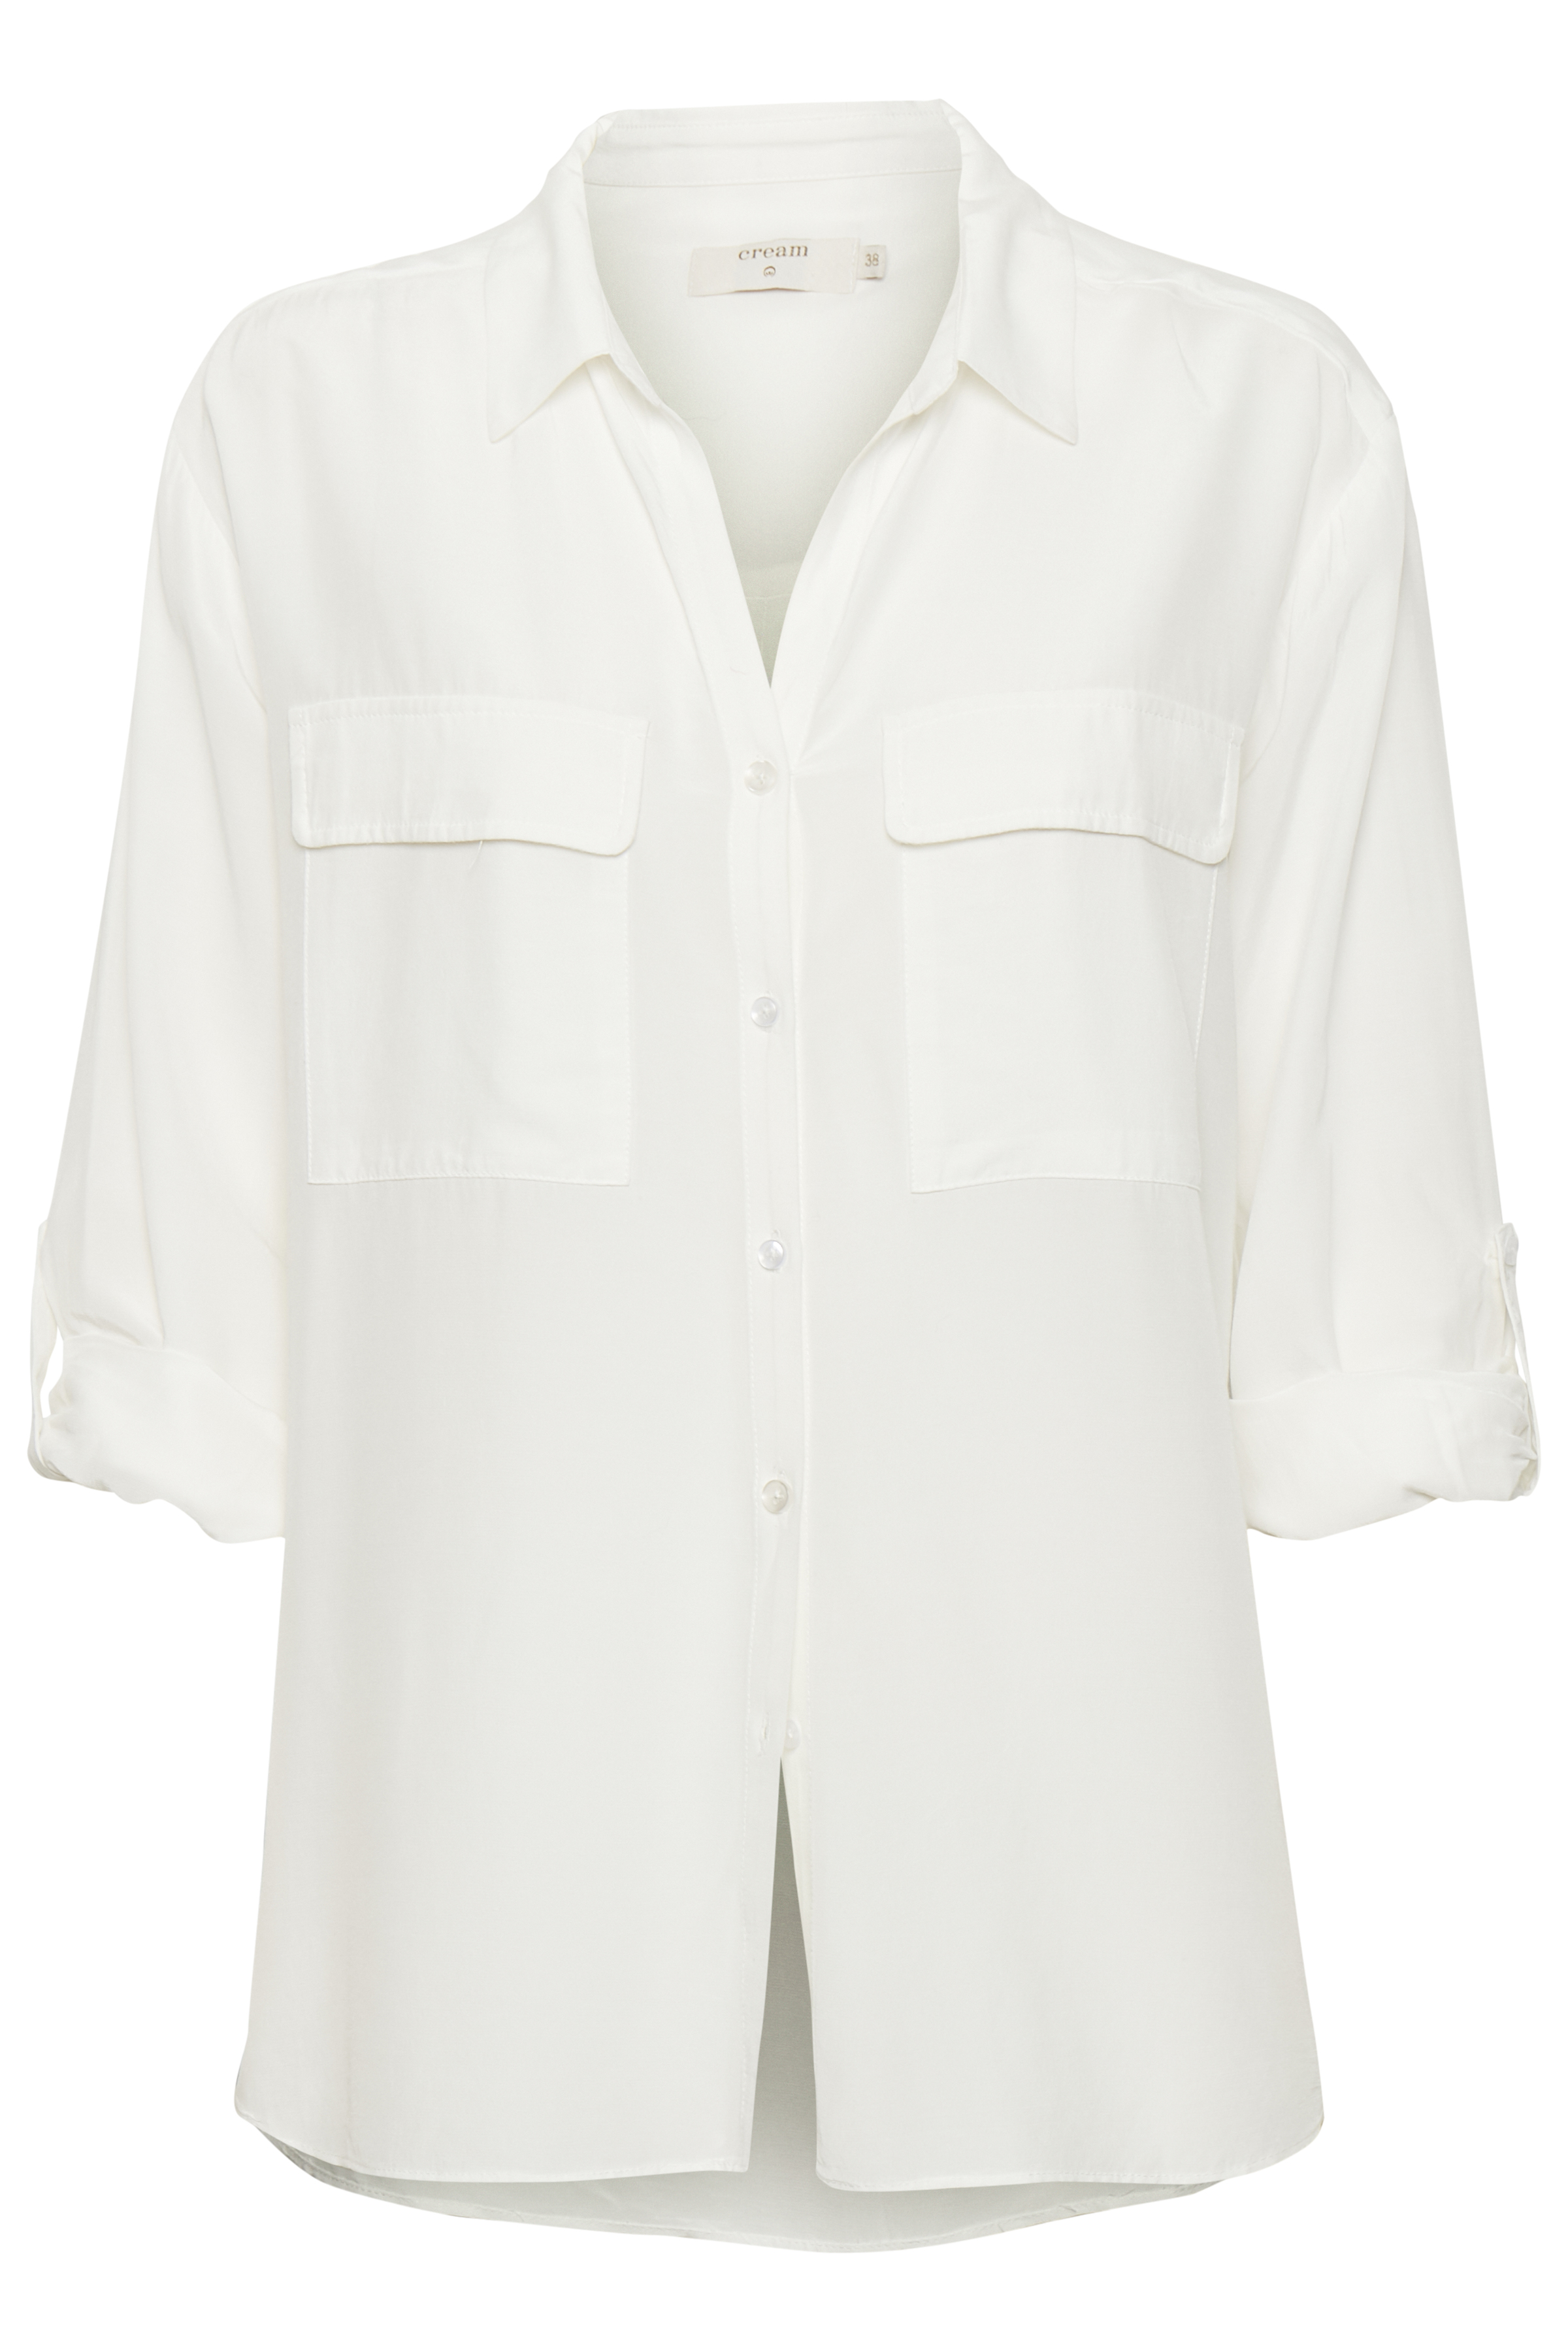 Image of Cream Dame Skjorte - Off-white